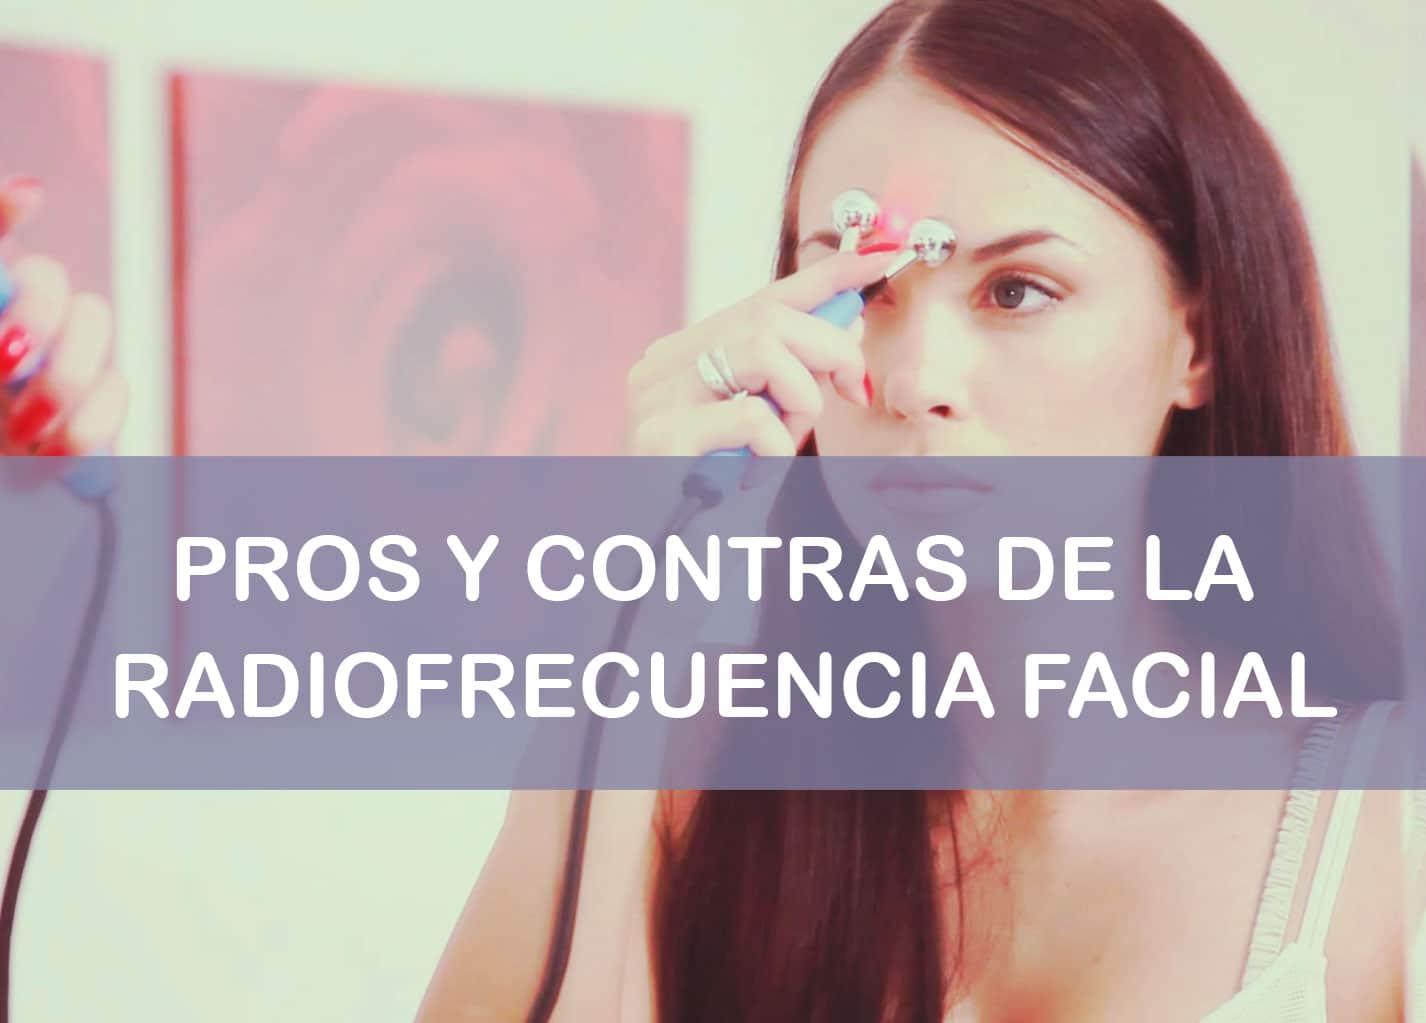 Radiofrecuencia facial ventajas e inconvenientes